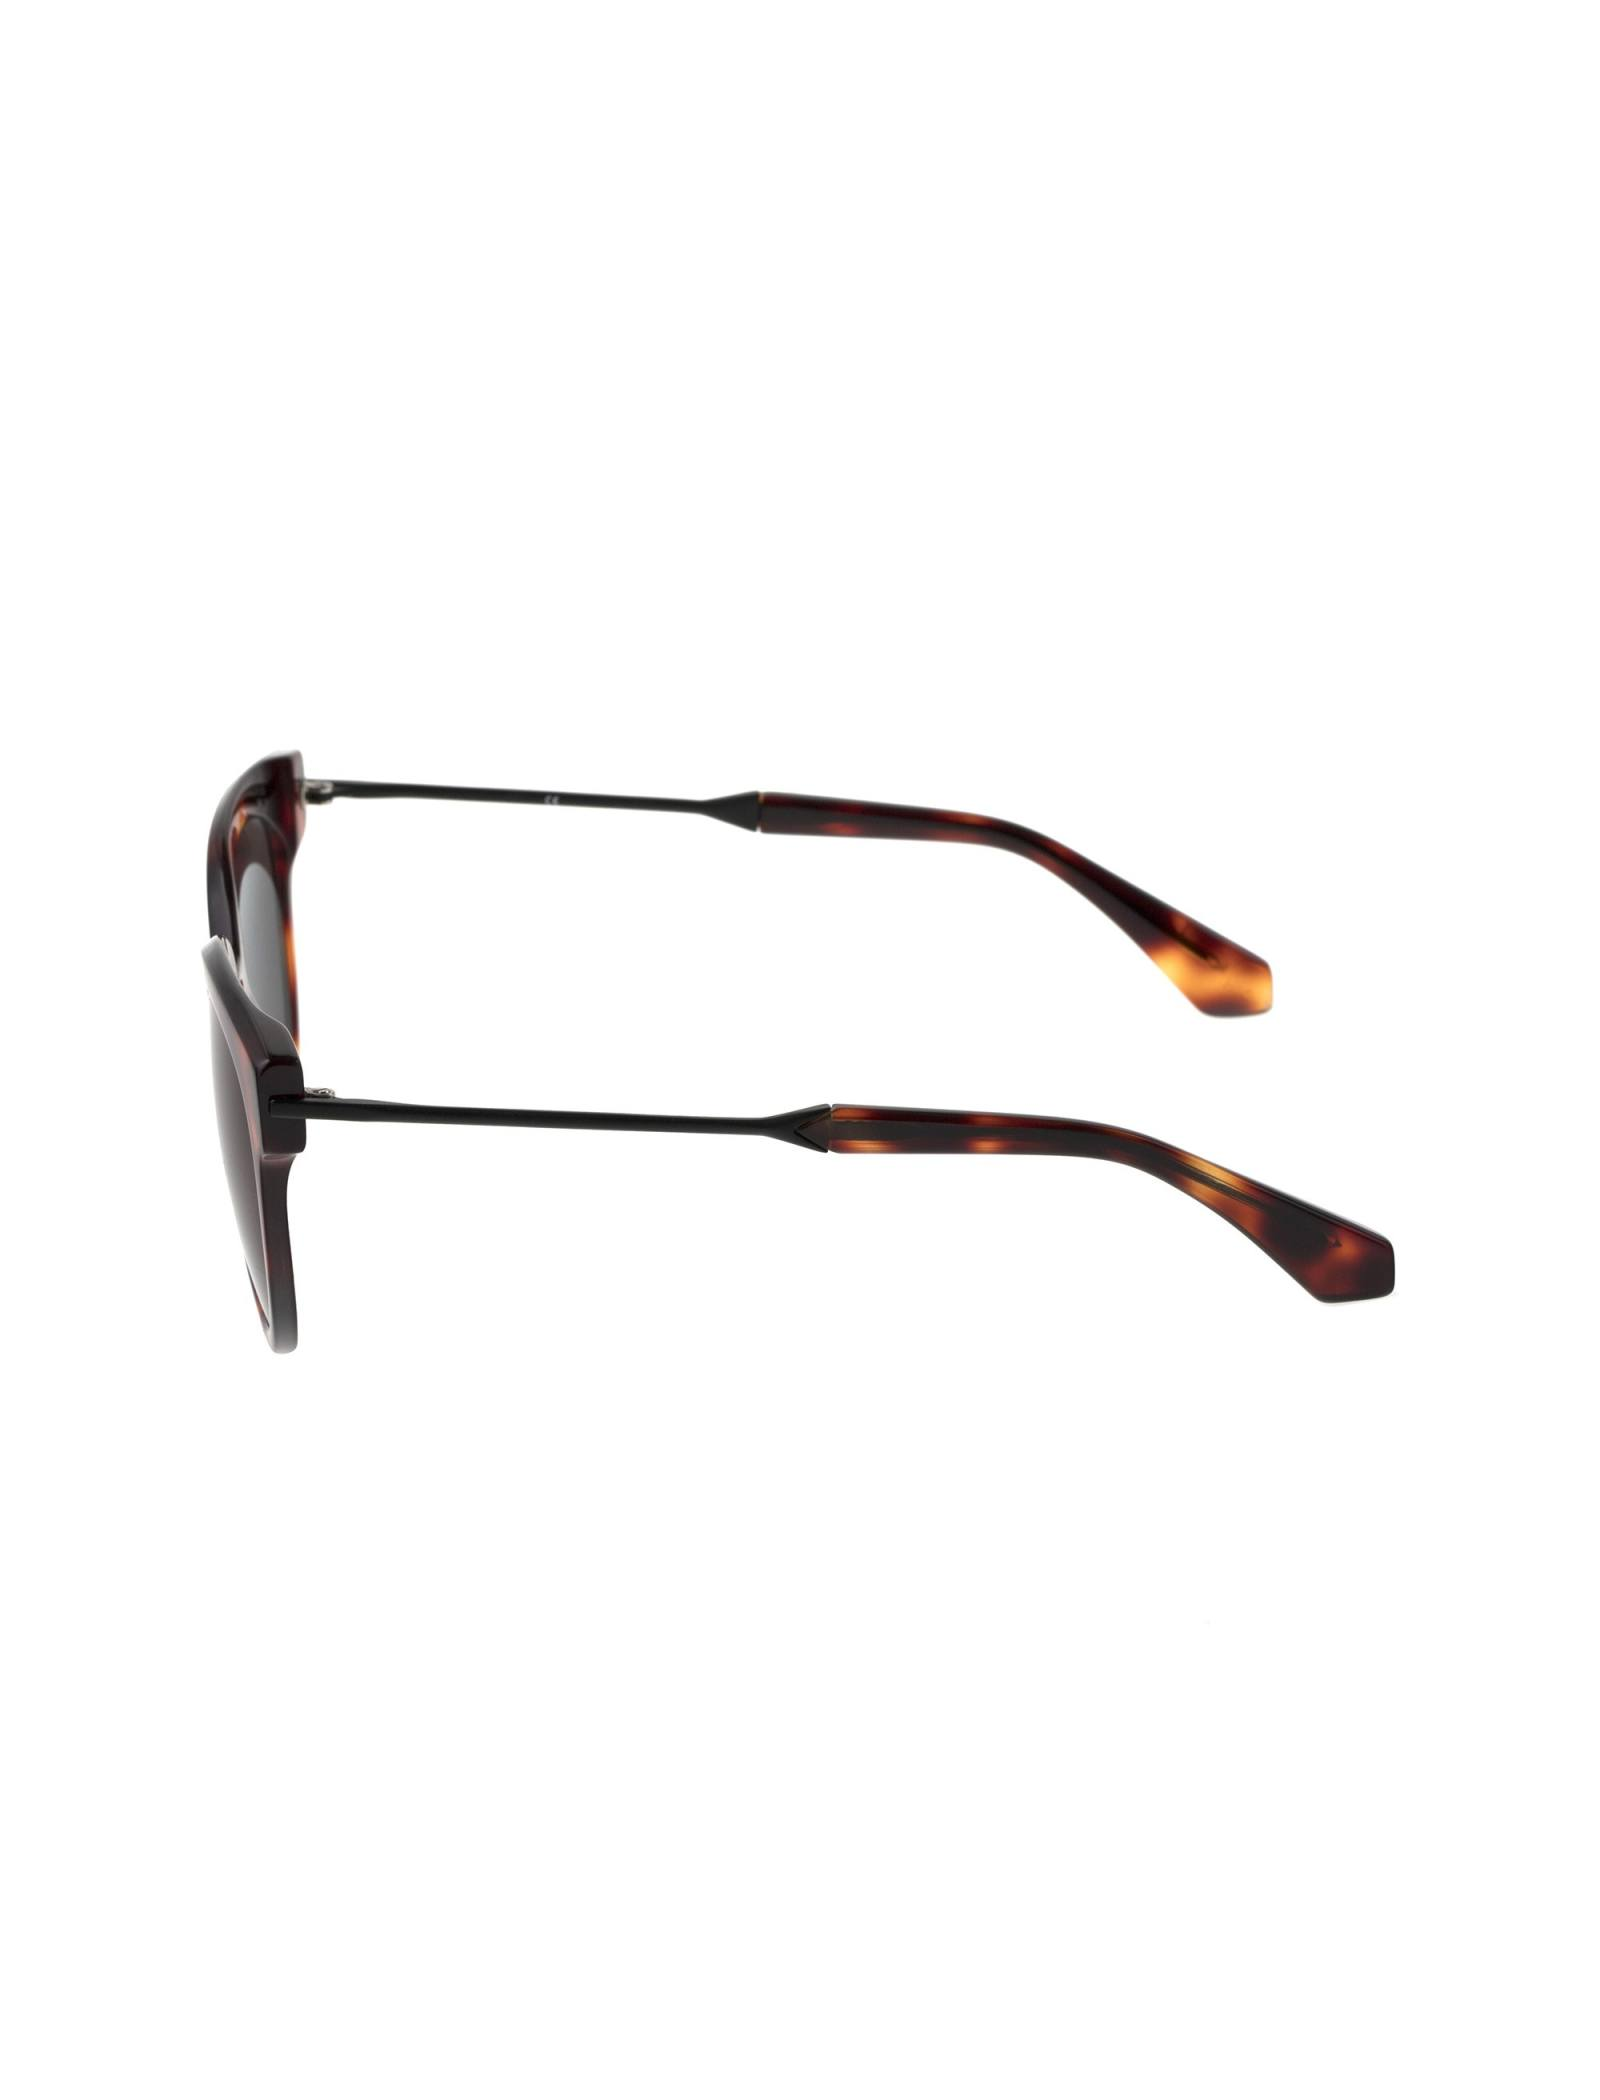 عینک آفتابی پنتوس زنانه - ساندرو - قهوه اي  - 3